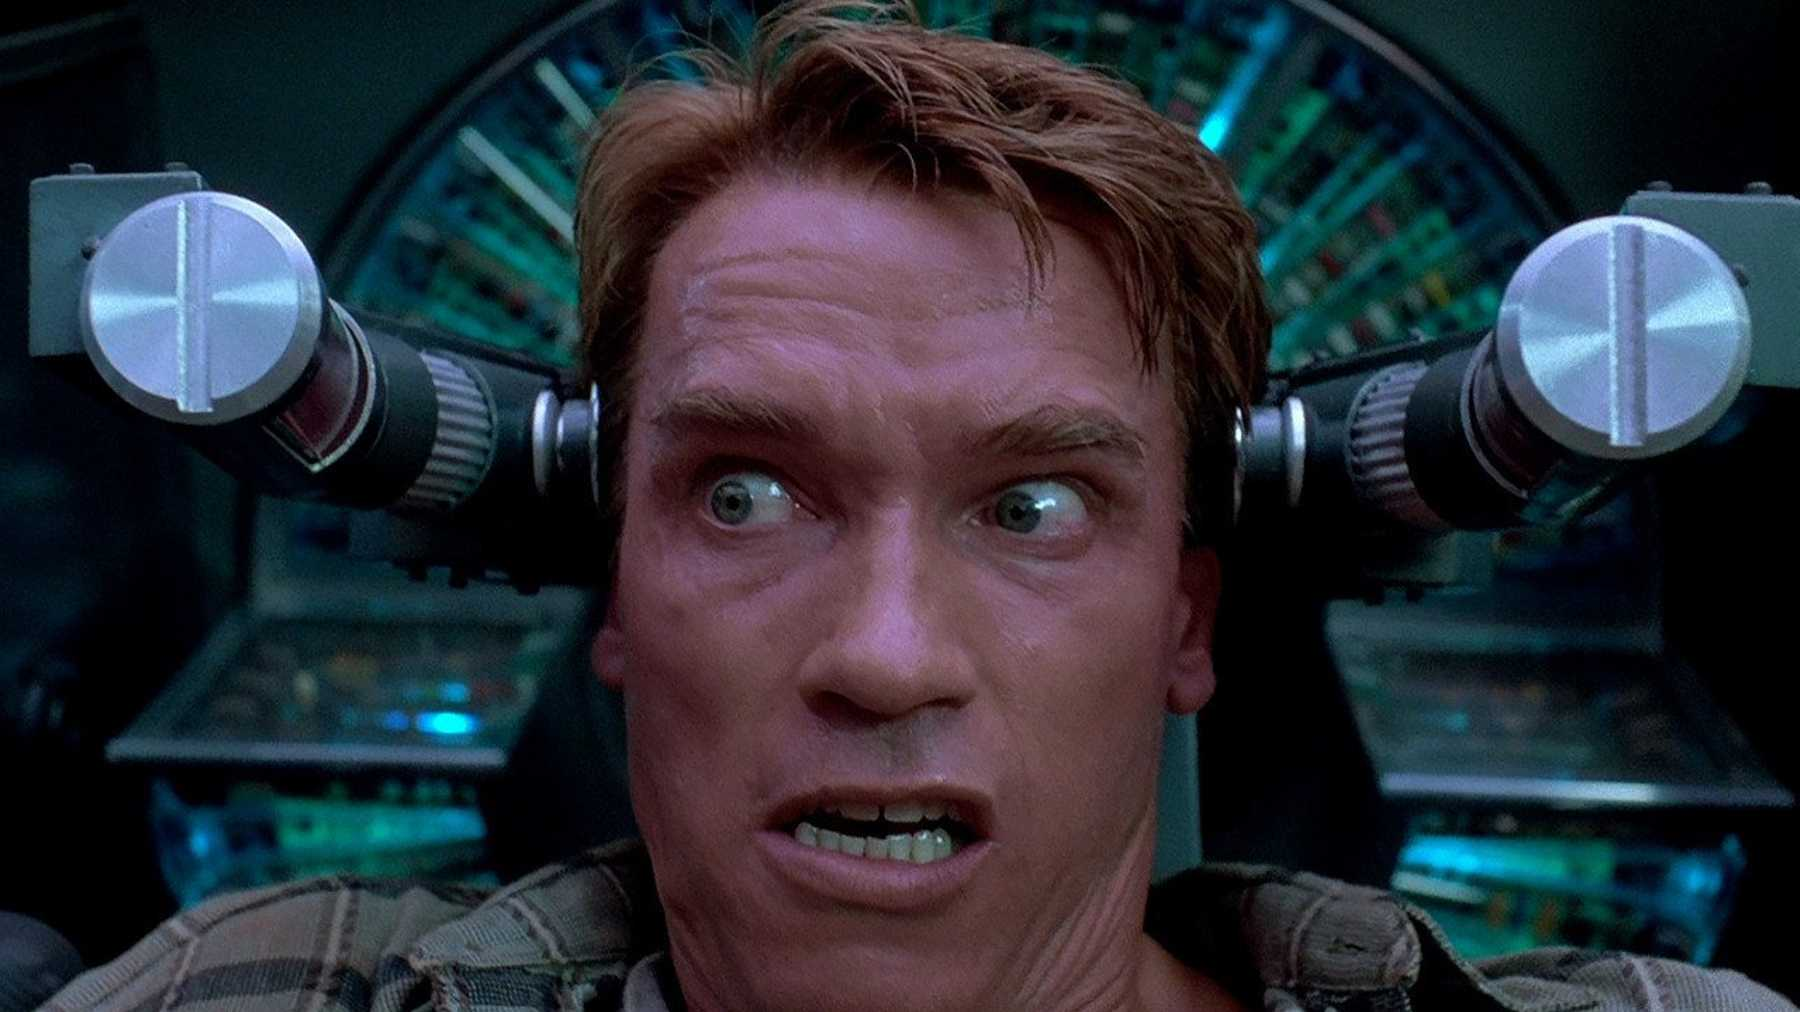 19a 1 20 Futuristic Facts About RoboCop 2